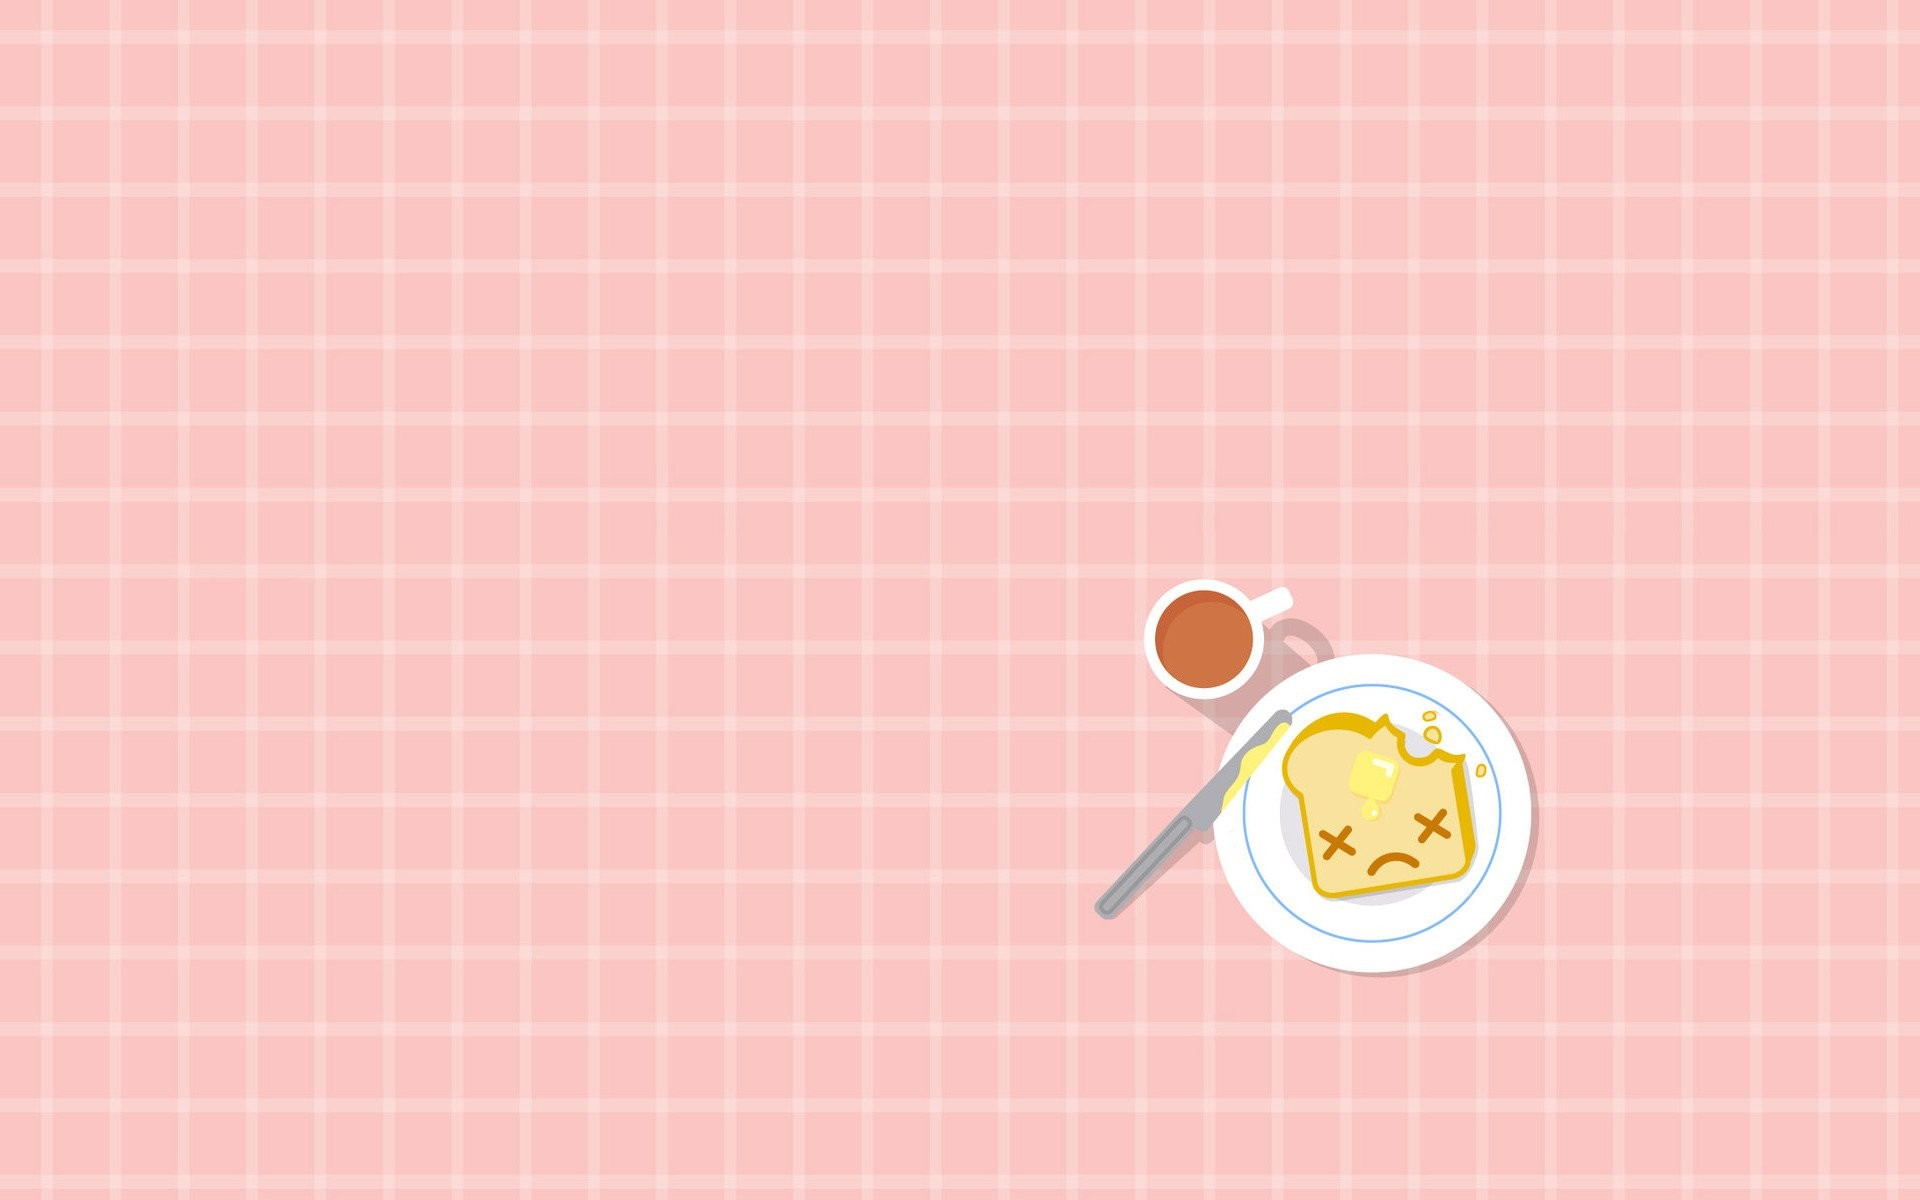 hinh-nen-cute-cho-may-tinh-dep-nhat-wallppaer-cute-23.jpg